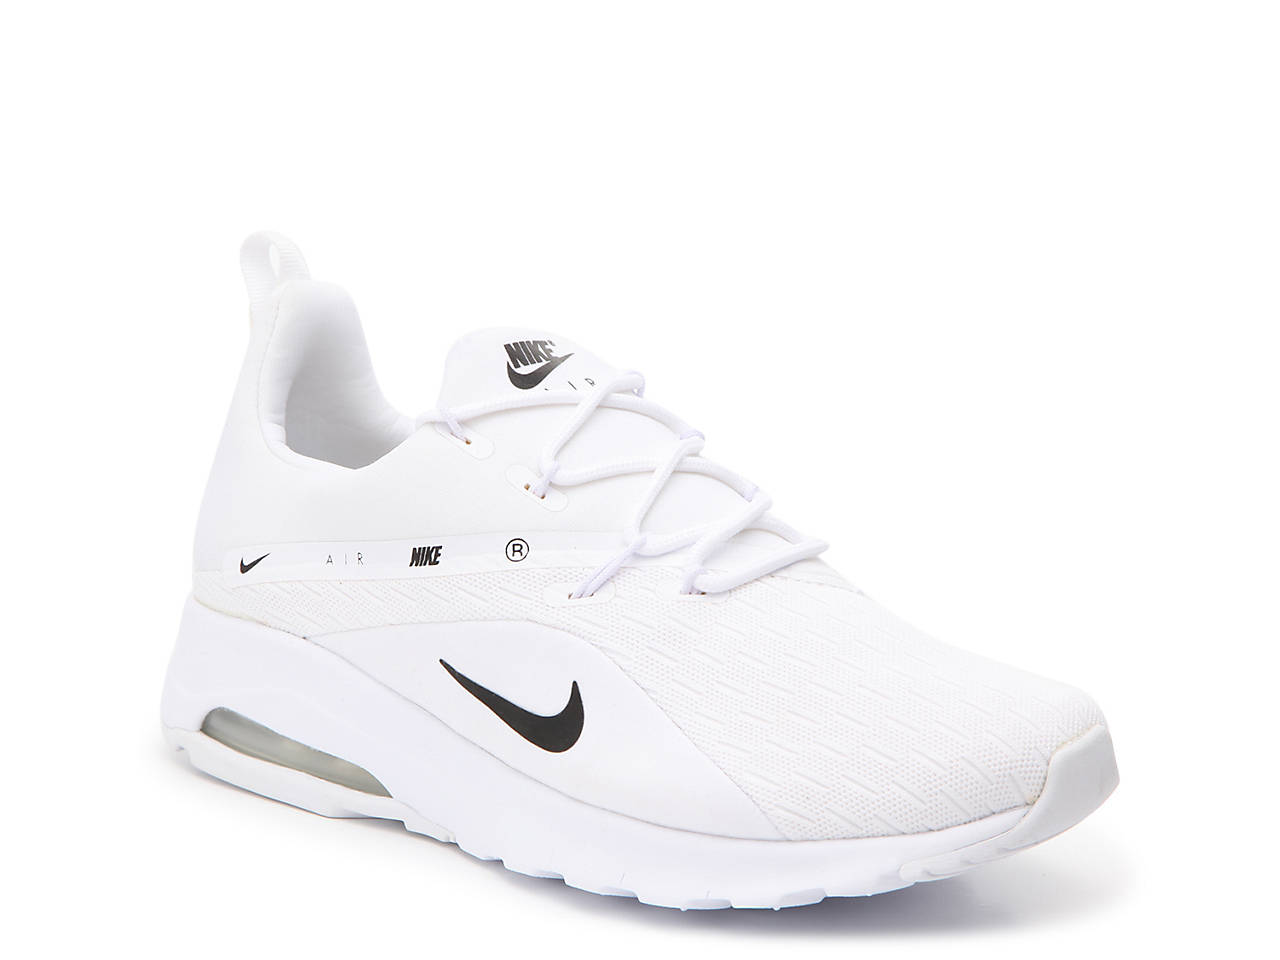 nike sale cheap leggings, nike air max motion black white